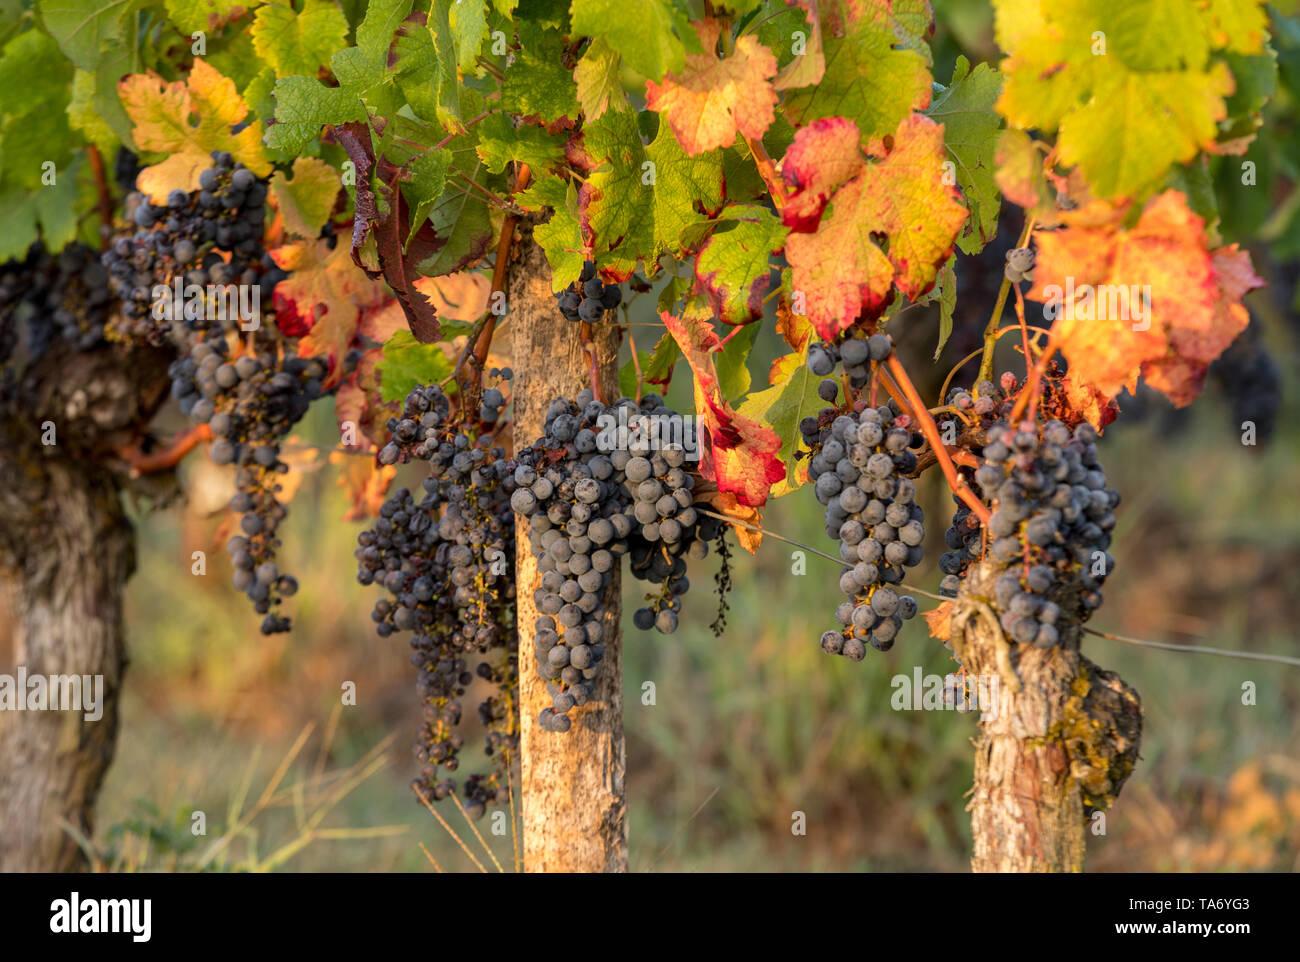 Morning light in the vineyards of Saint Georges de Montagne near Saint Emilion, Gironde, France - Stock Image